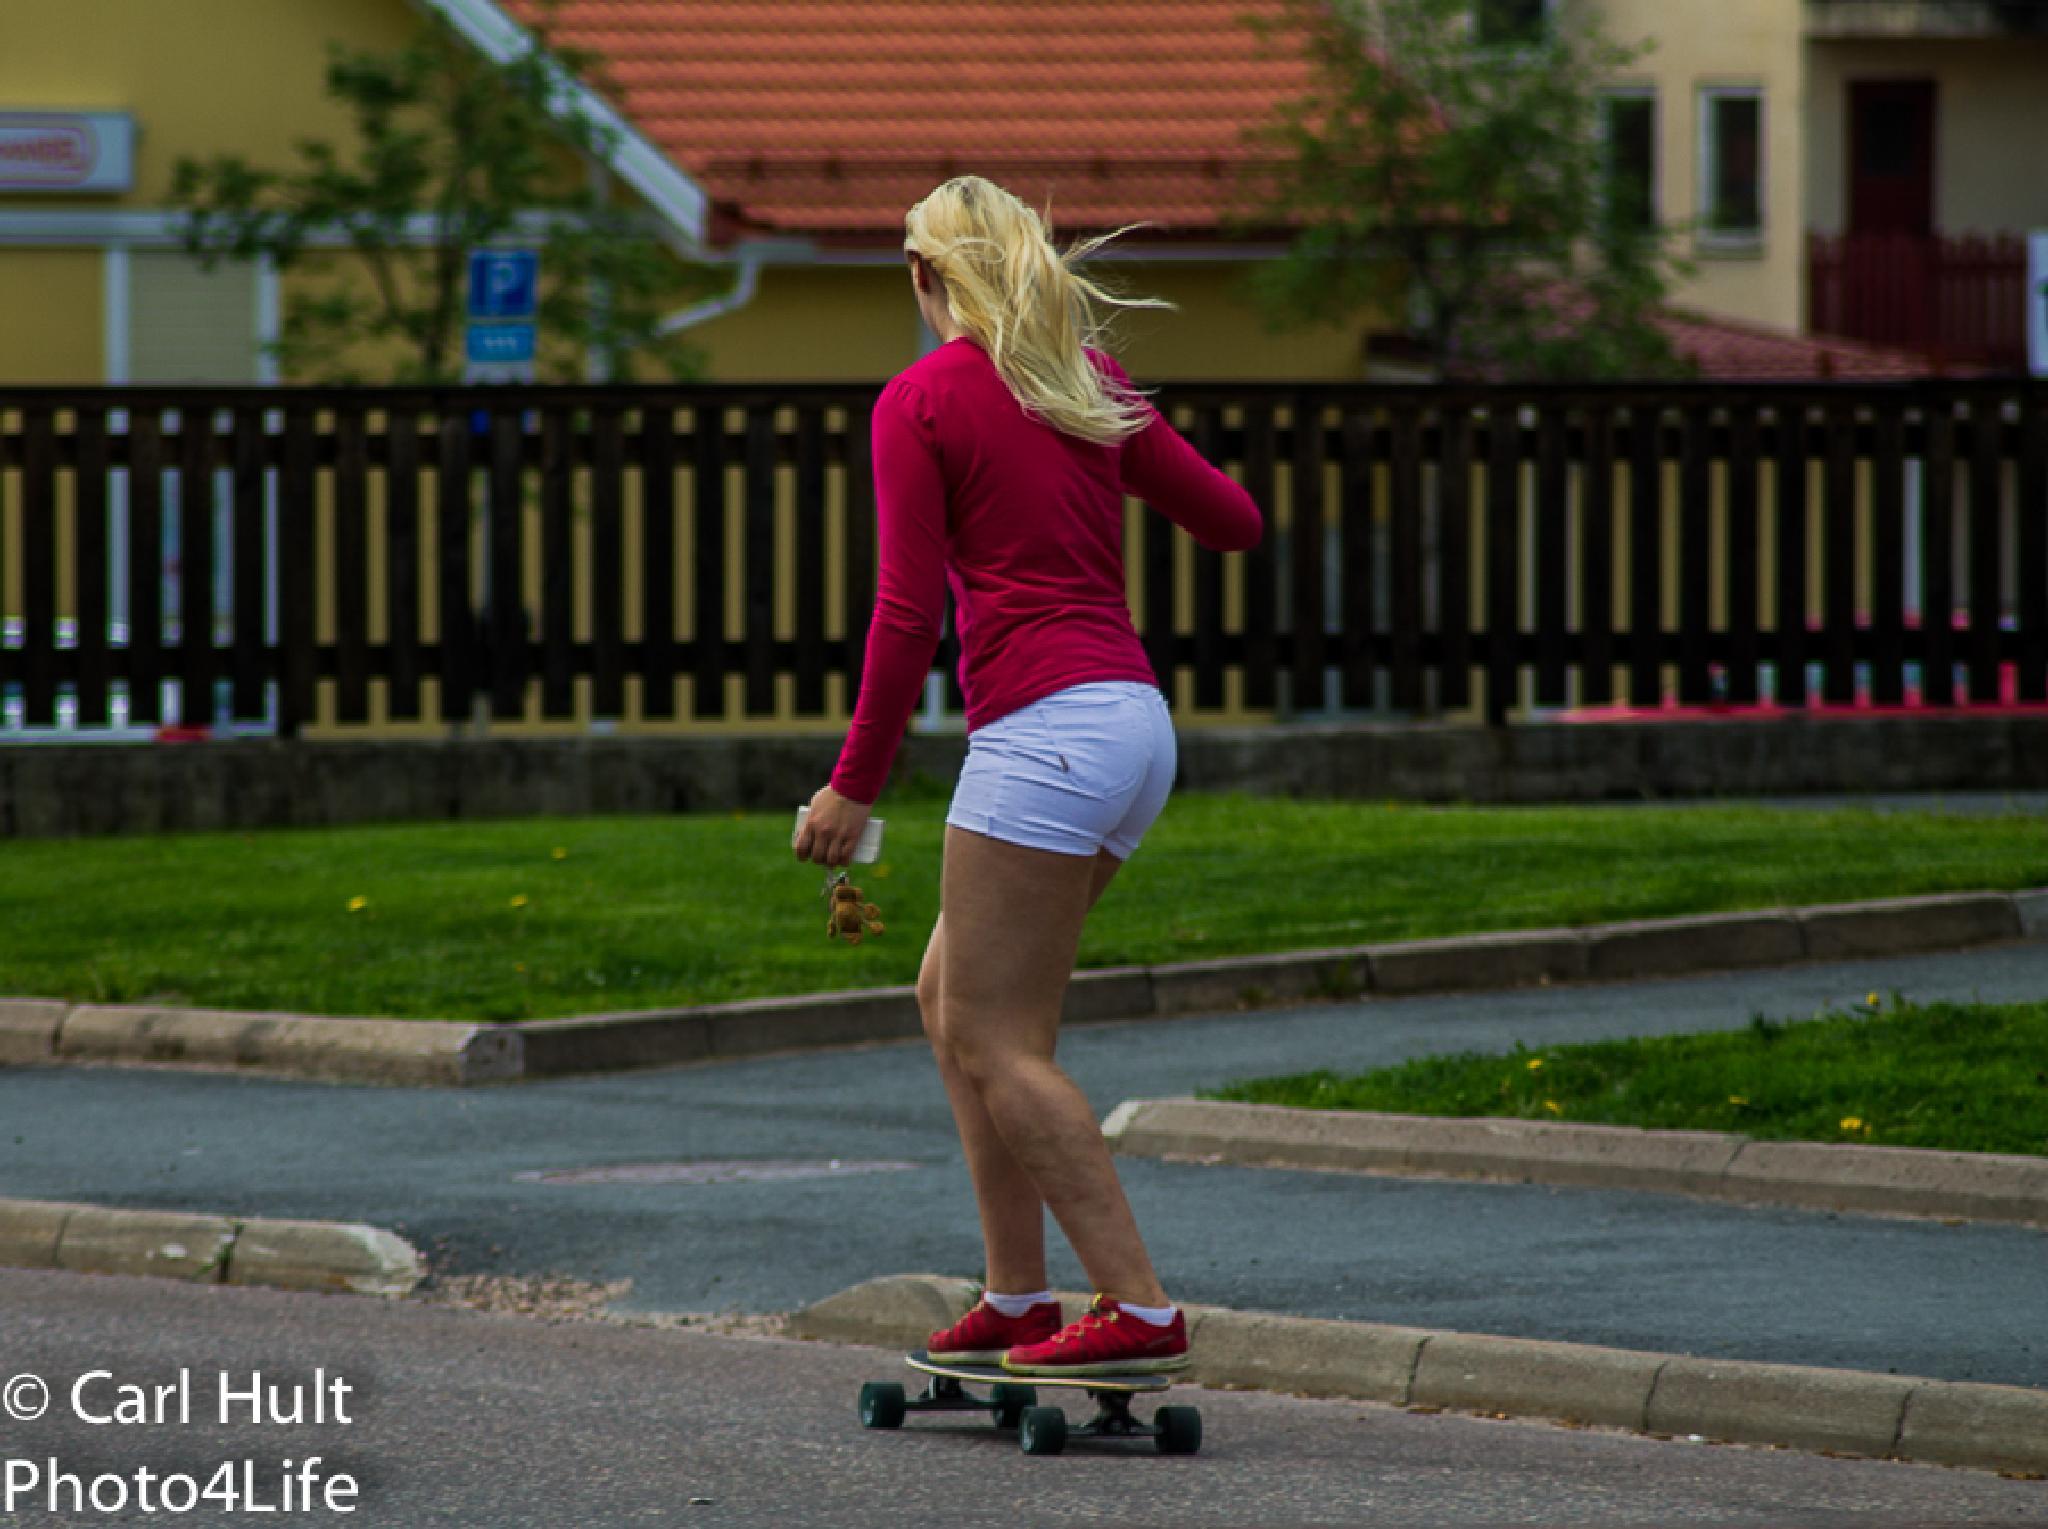 Girl on skateboard by Carl Hult